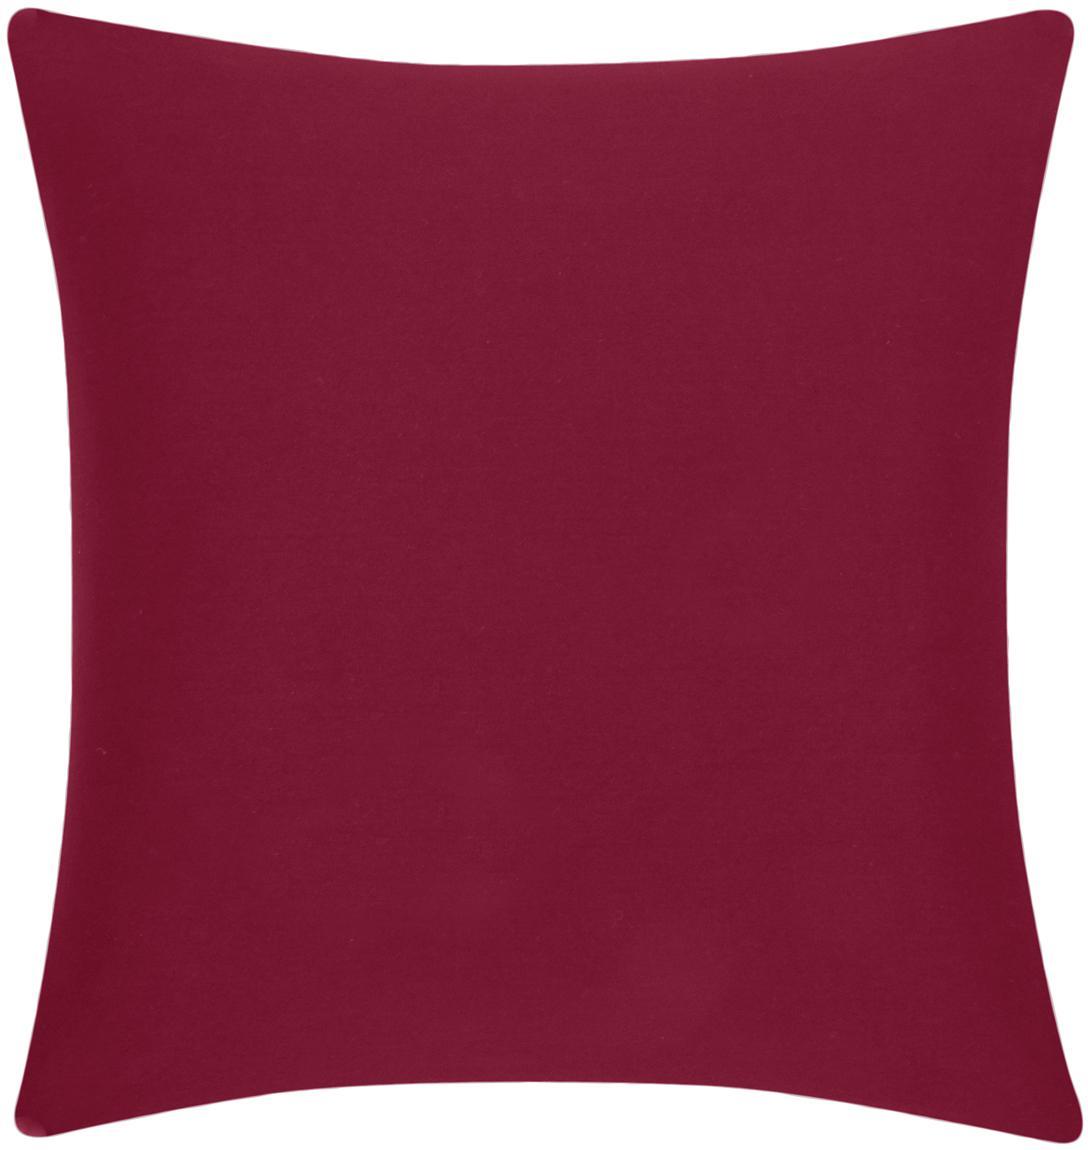 Kussenhoes Mads, 100% katoen, Rood, 40 x 40 cm